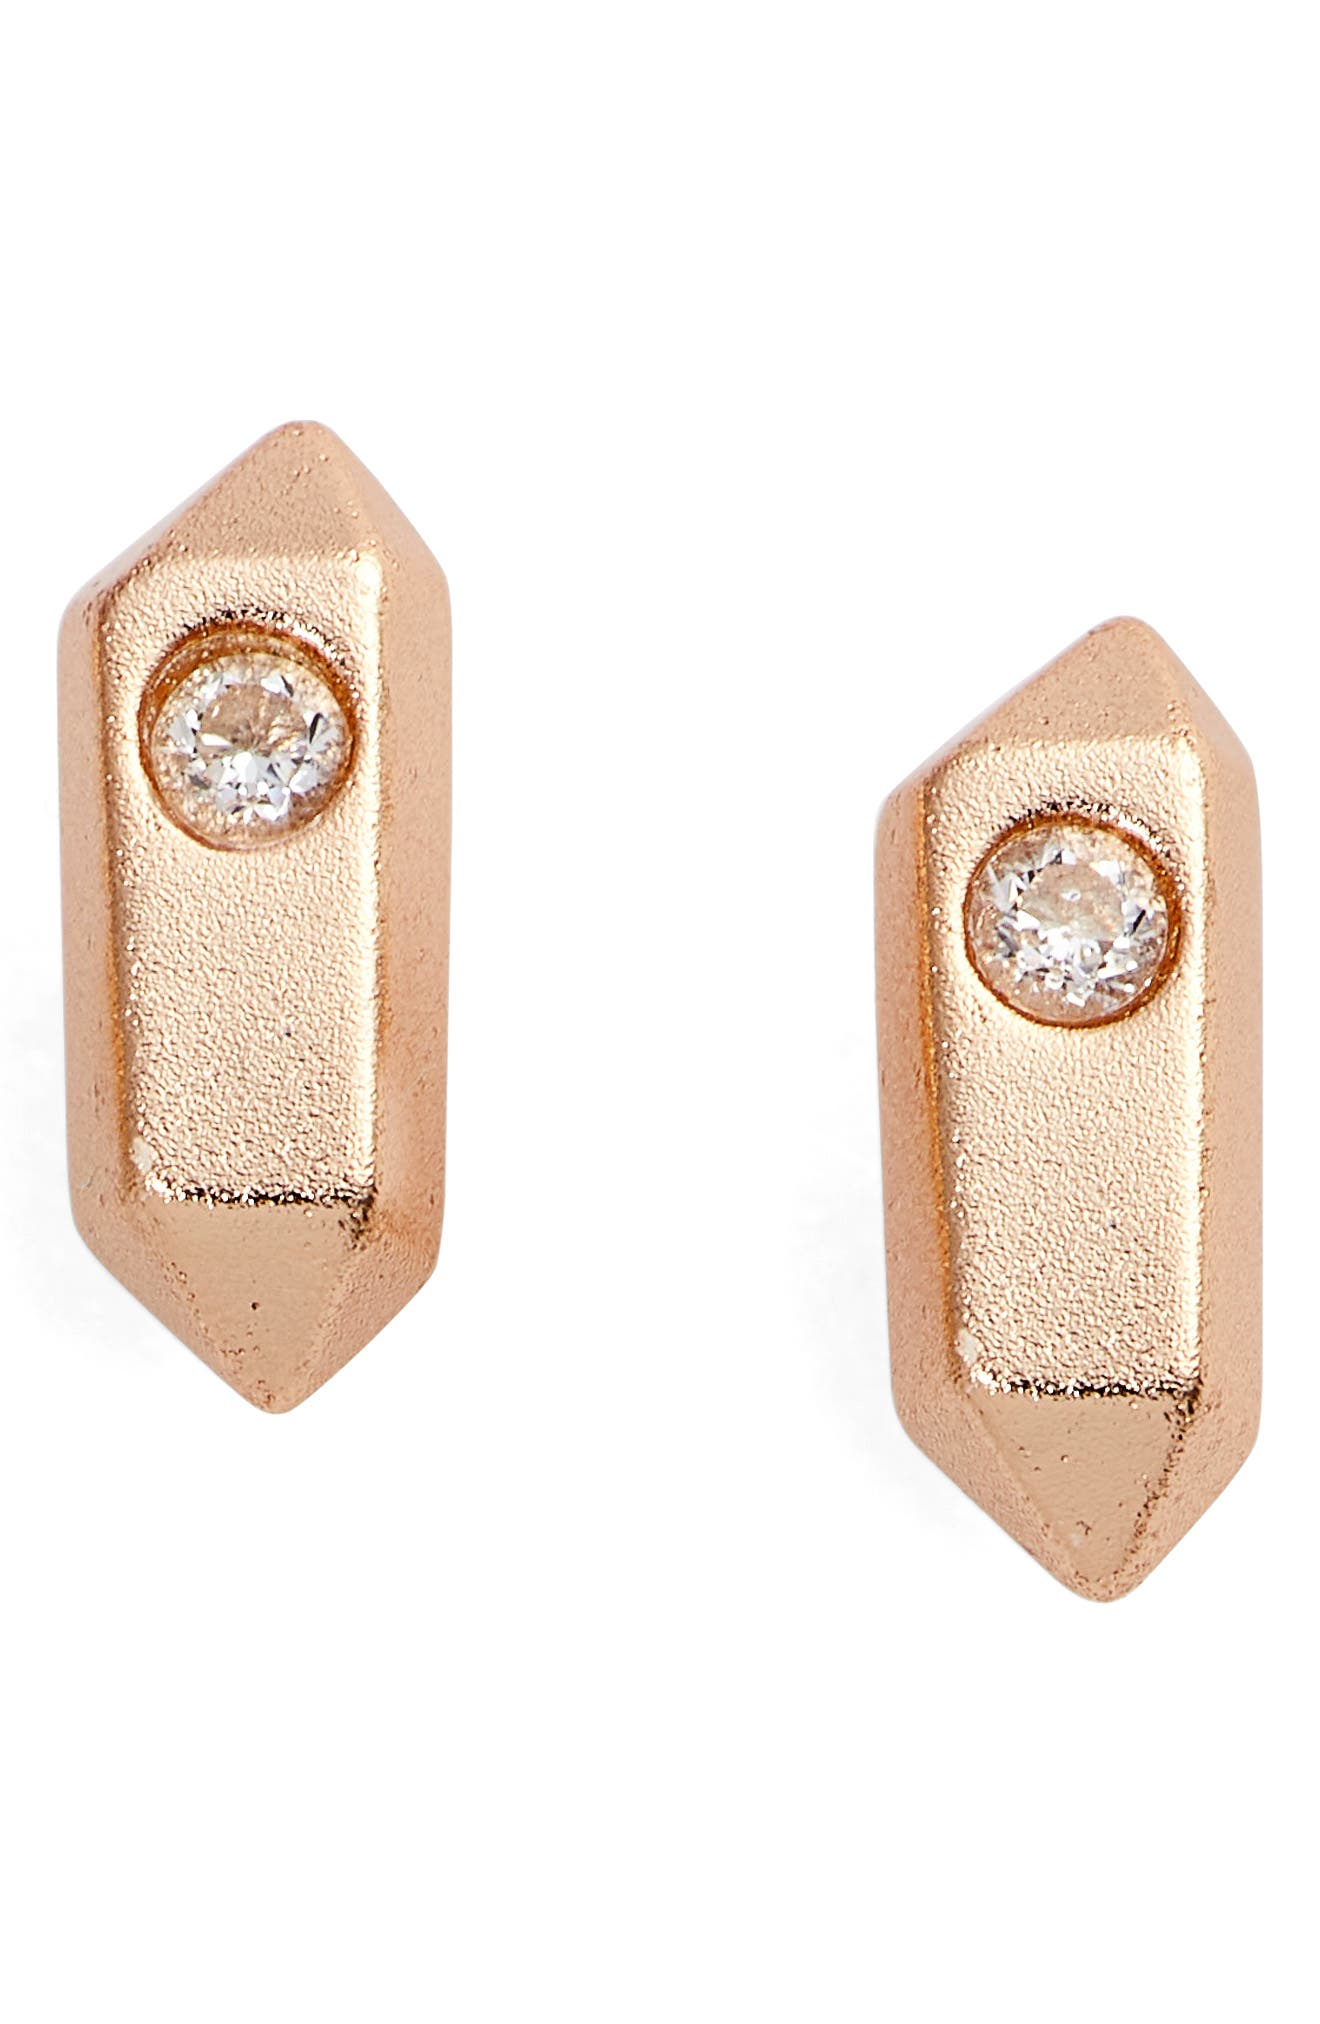 Rooney Stud Earrings,                             Main thumbnail 2, color,